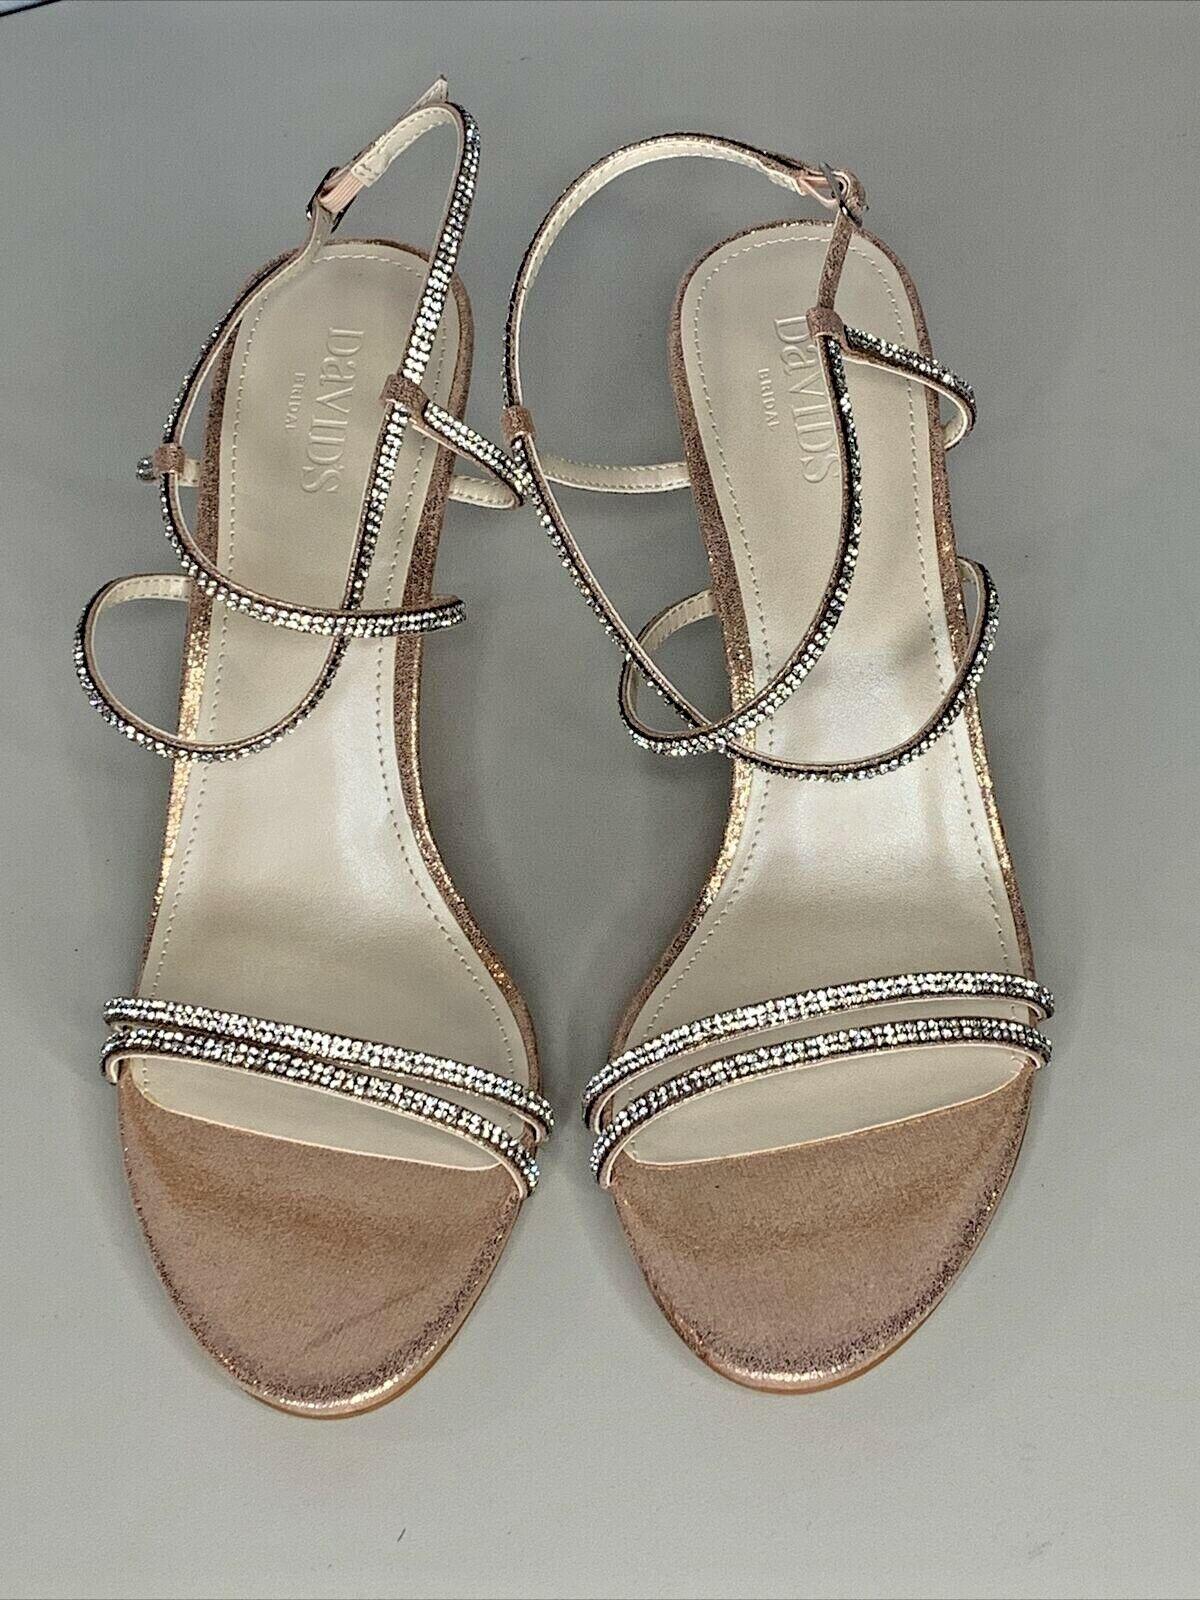 David's Bridal Shoes Heels Size 11 Lyla Rose Gold Sandal Heels